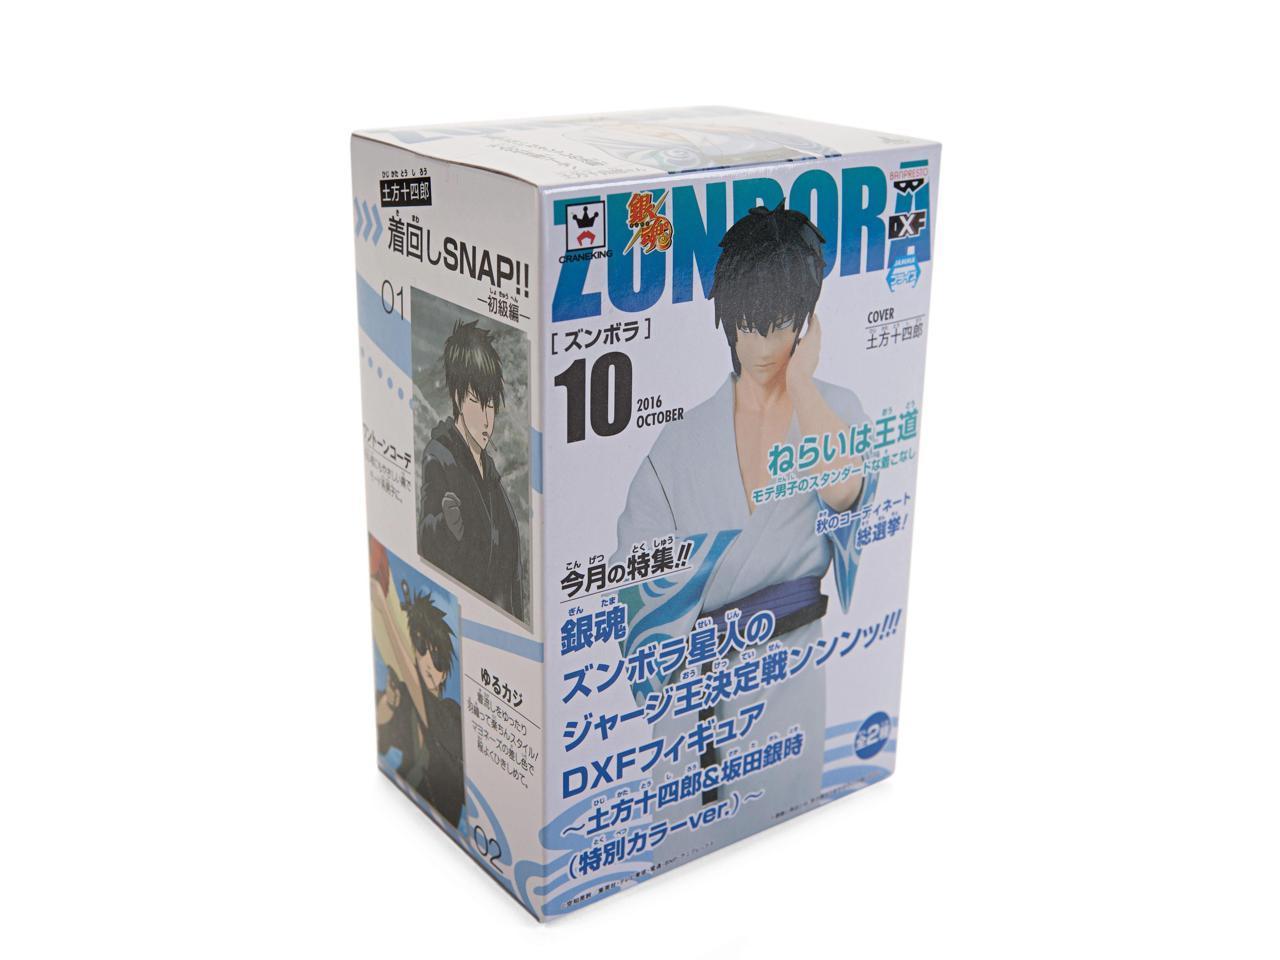 DXF Figure Gintama Hijikata Toushirou Jersey King Contest of Zunbora Ver